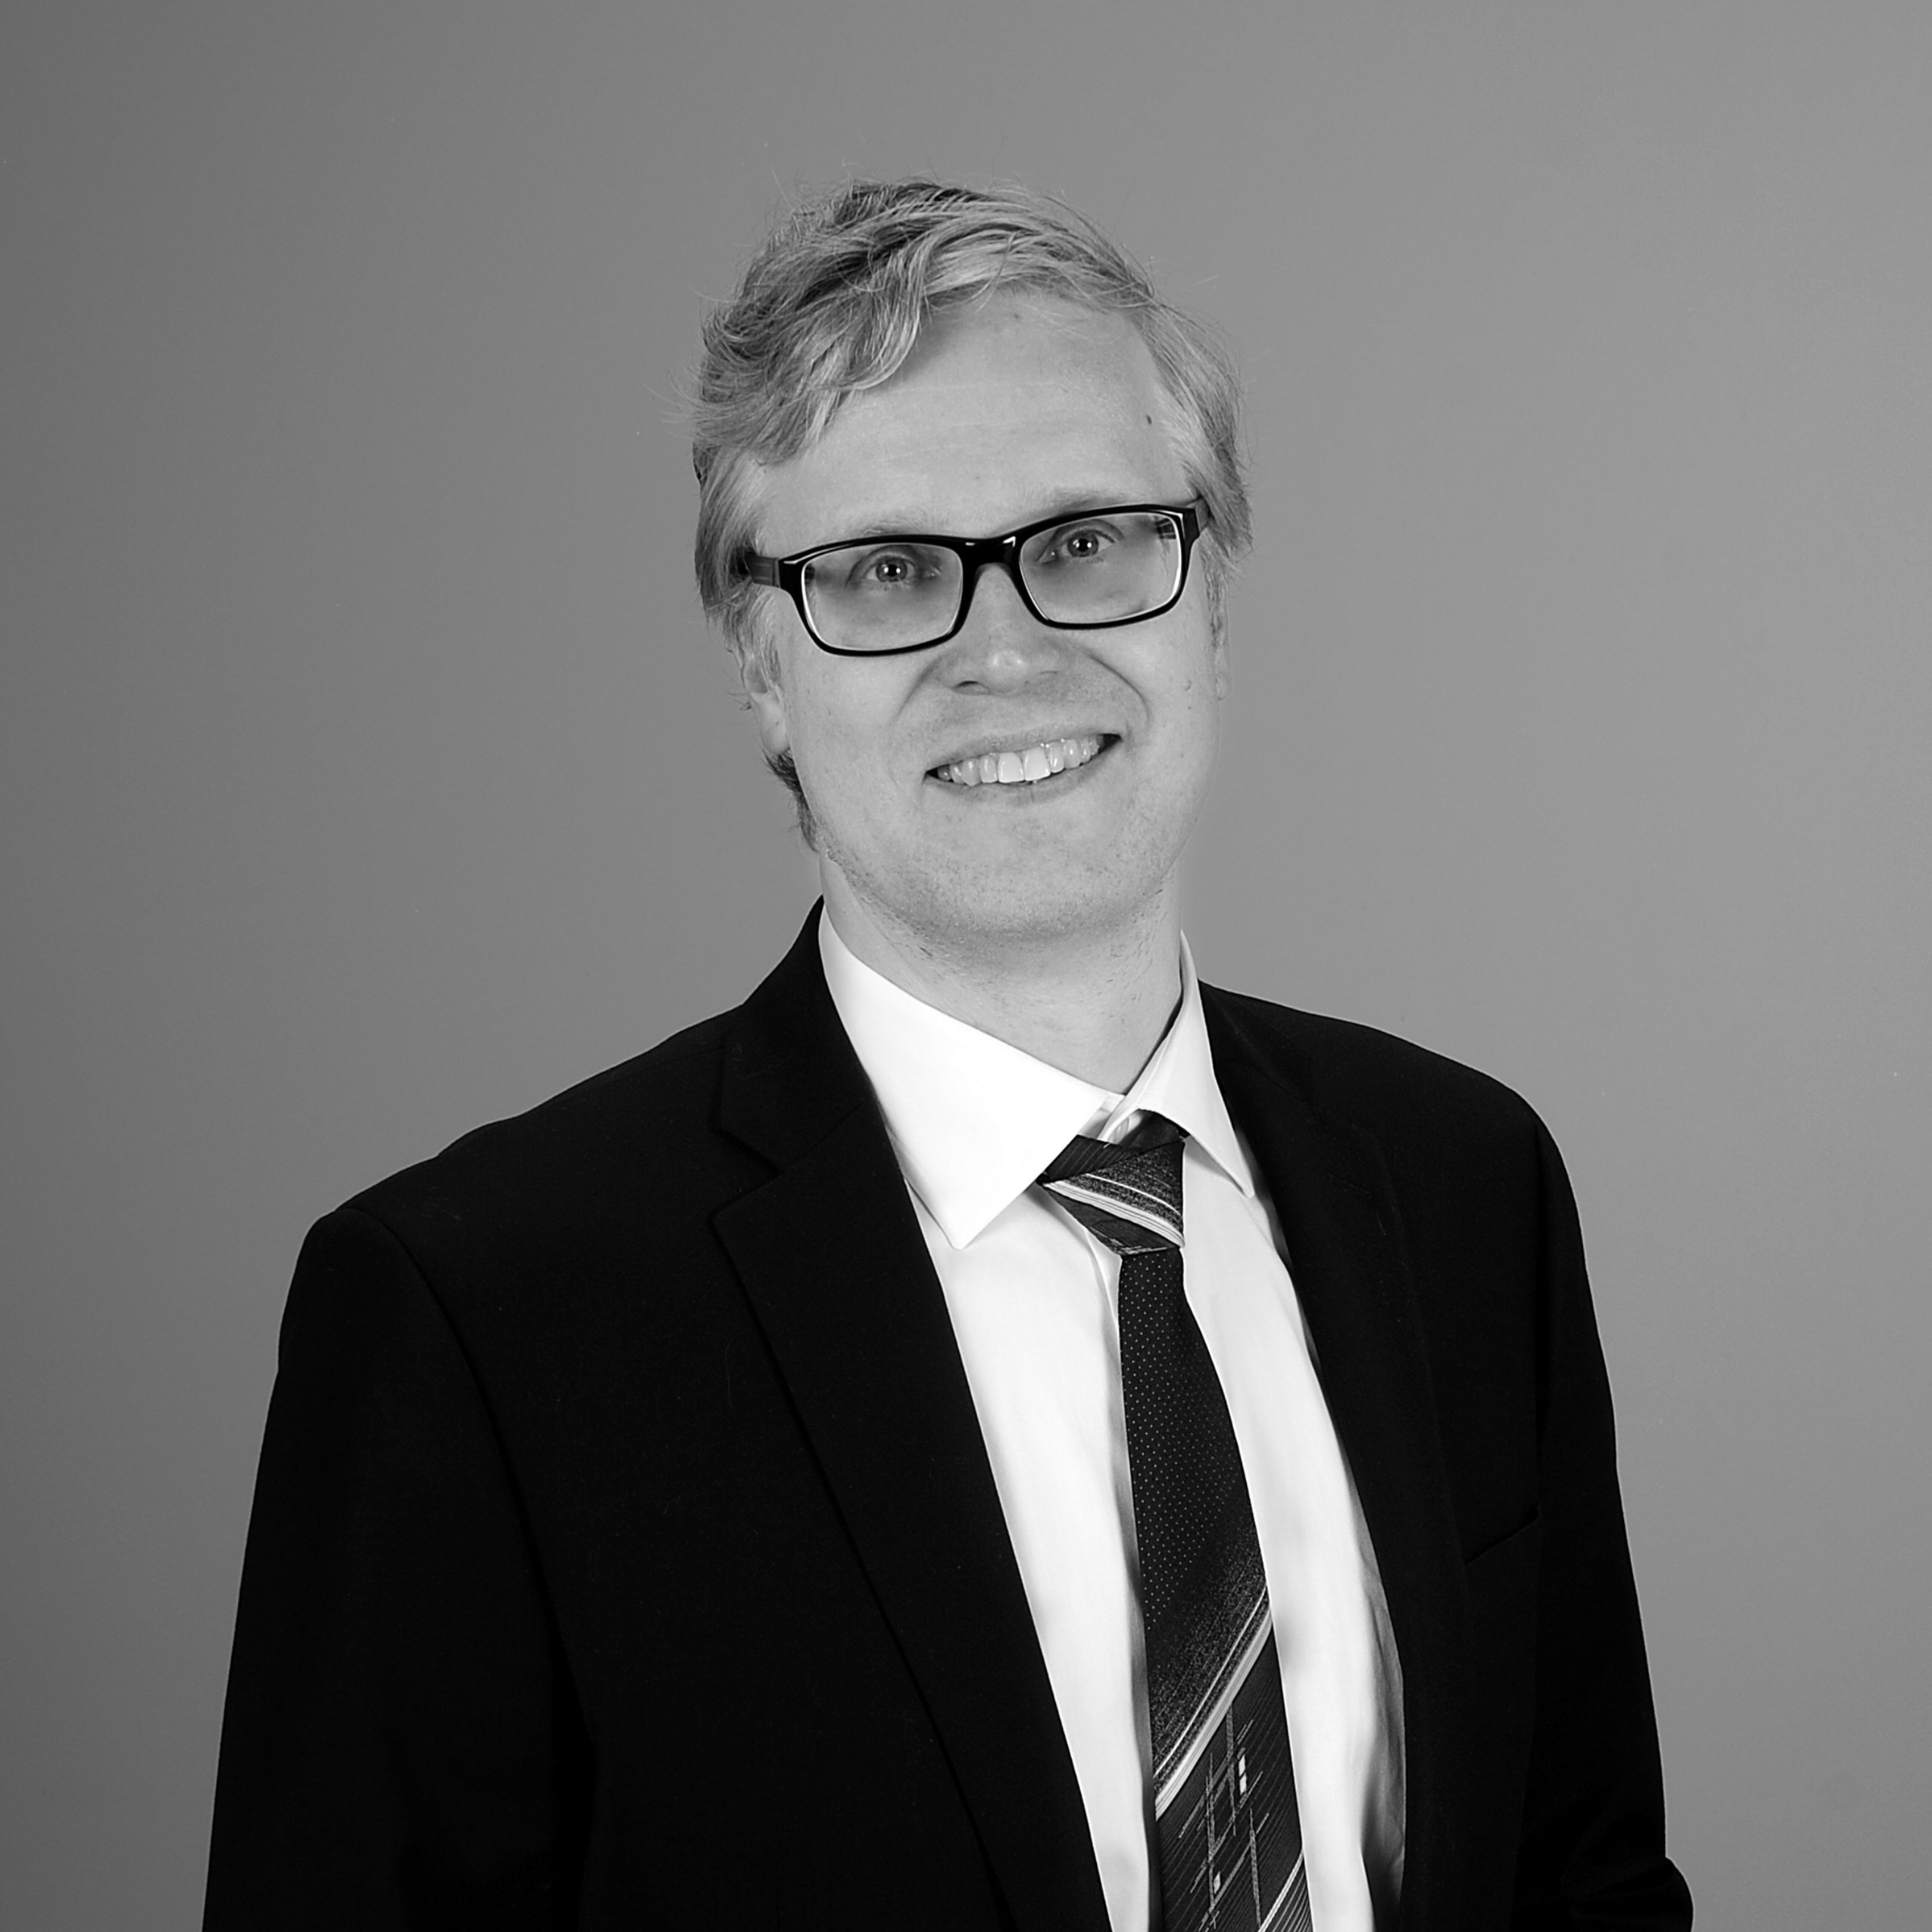 Tatu_Ylönen_board_member